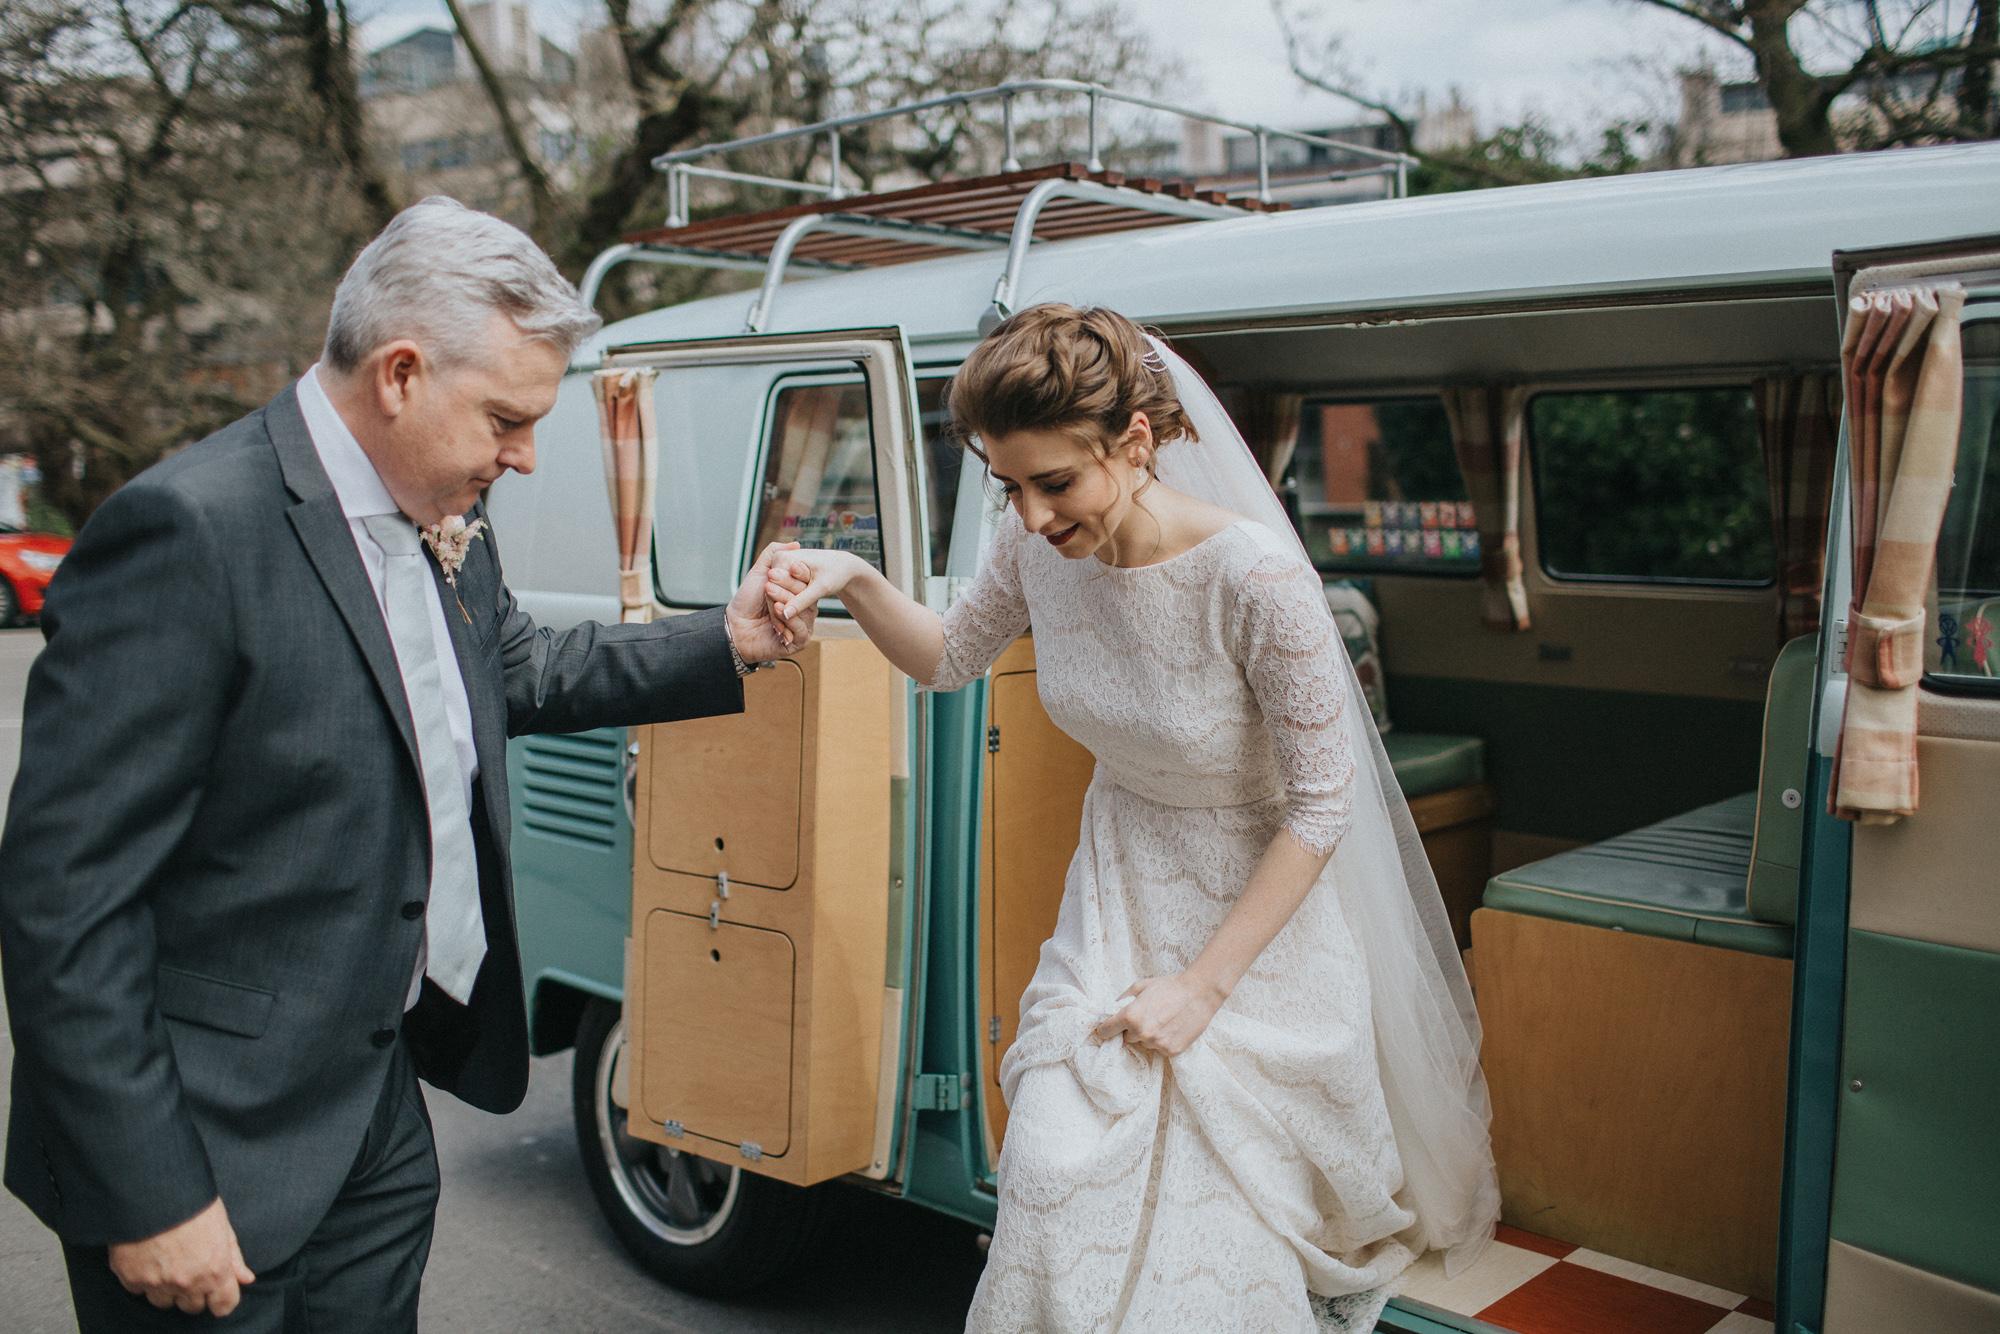 Kate-Beaumont-Lace-Flared-Dahlia-Gown-Leeds-Wedding-Bloom-Weddings-14.jpg